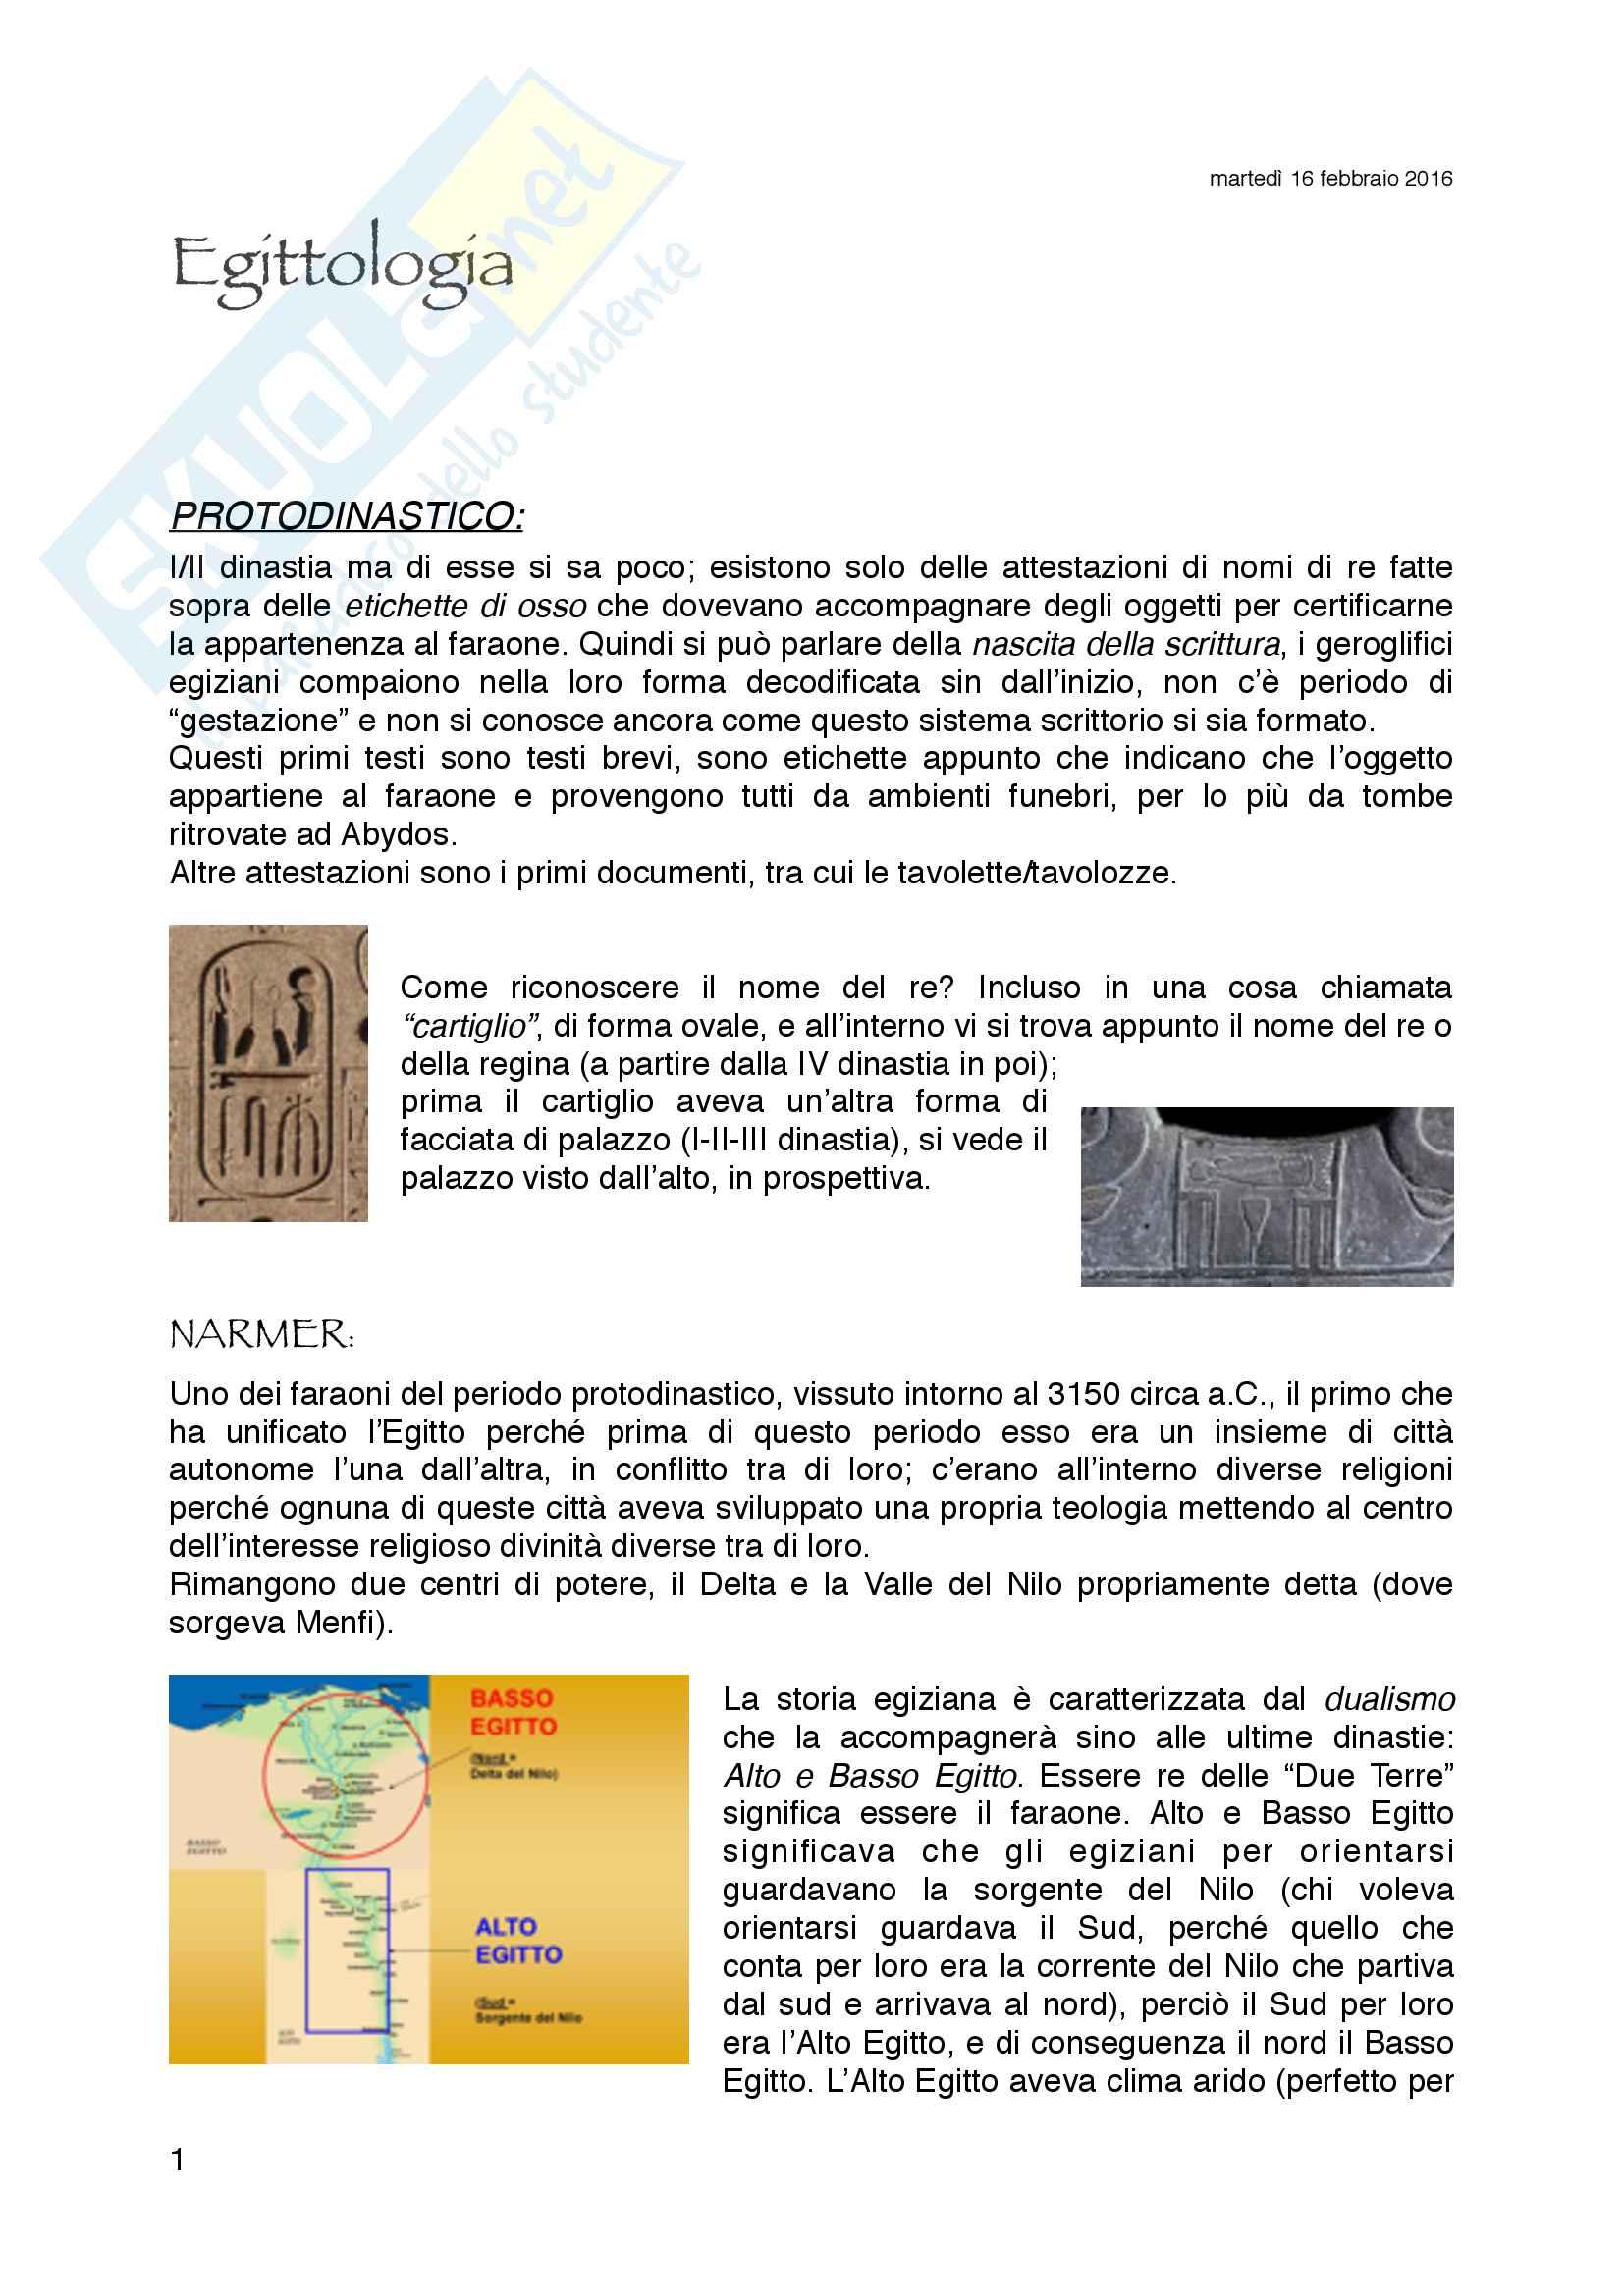 Riassunto esame e appunti esame egittologia, prof P. Gallo